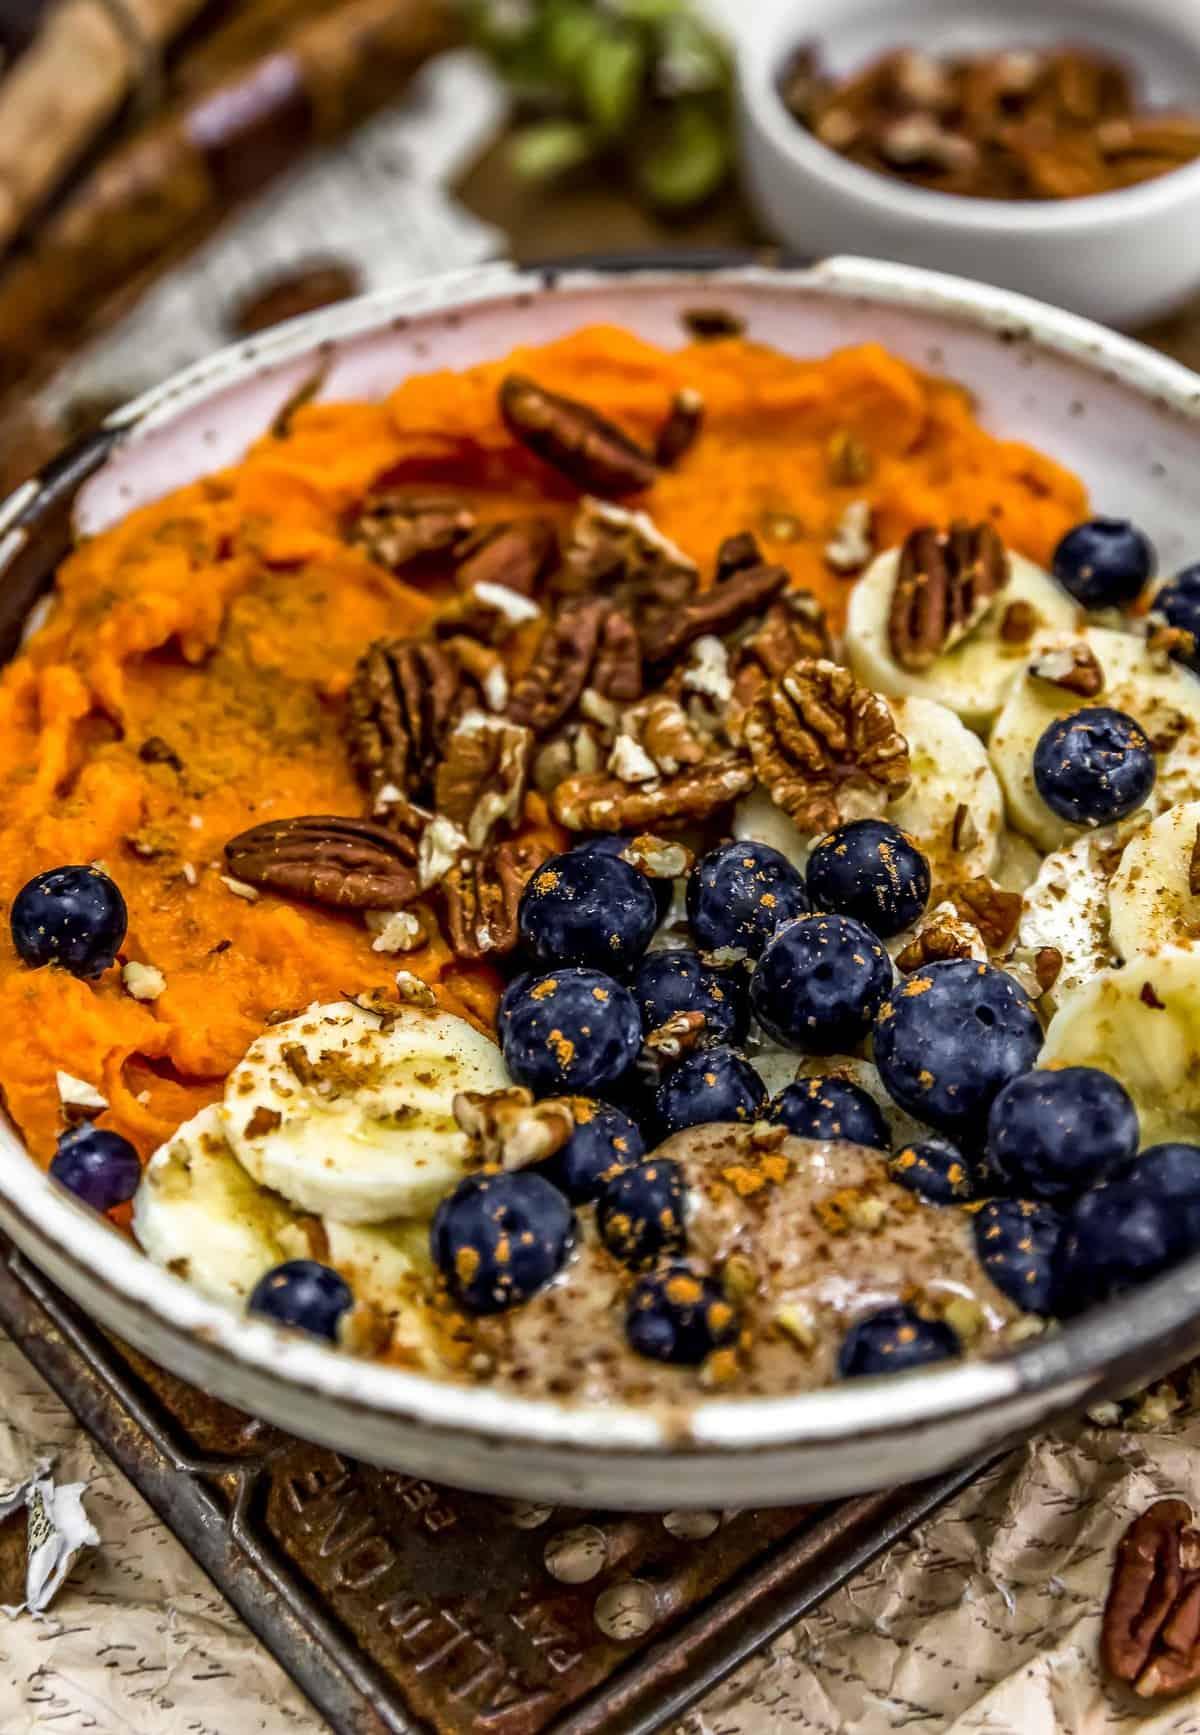 Close up of Cinnamon Blueberry Pecan Bowl